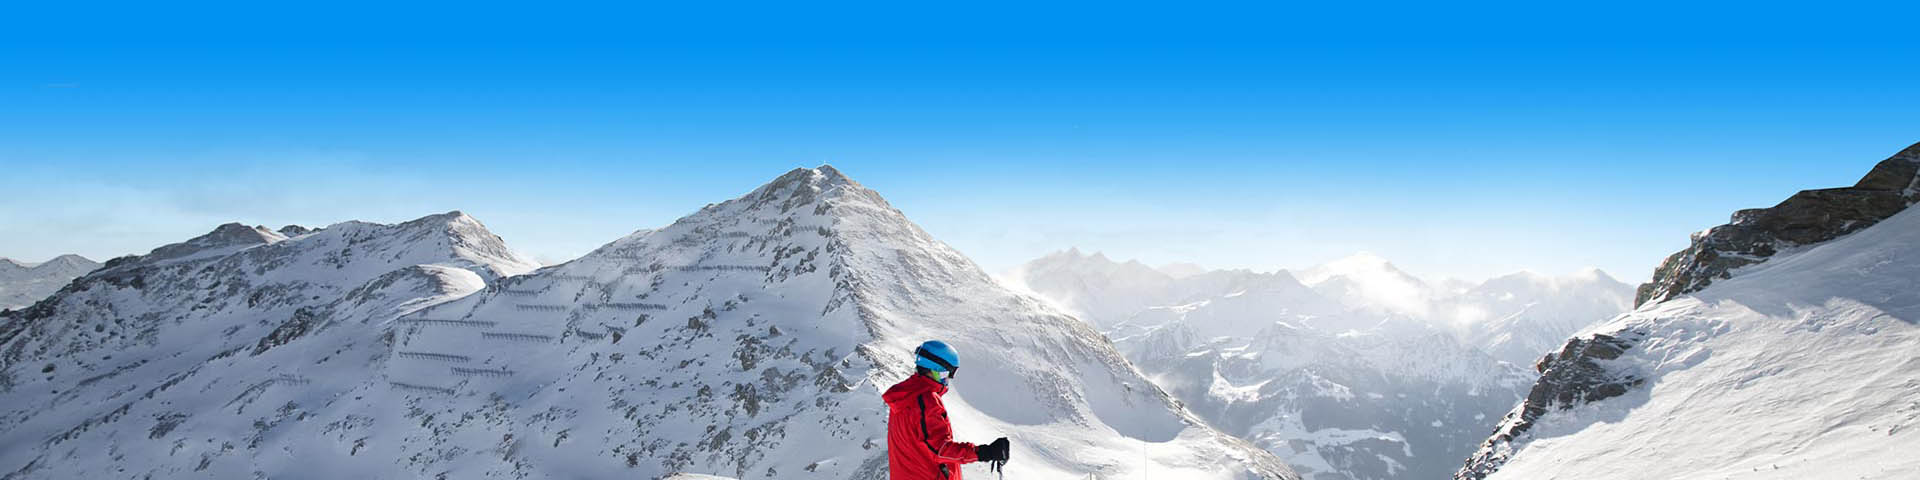 Skiër in besneeuwde bergen op wintersport